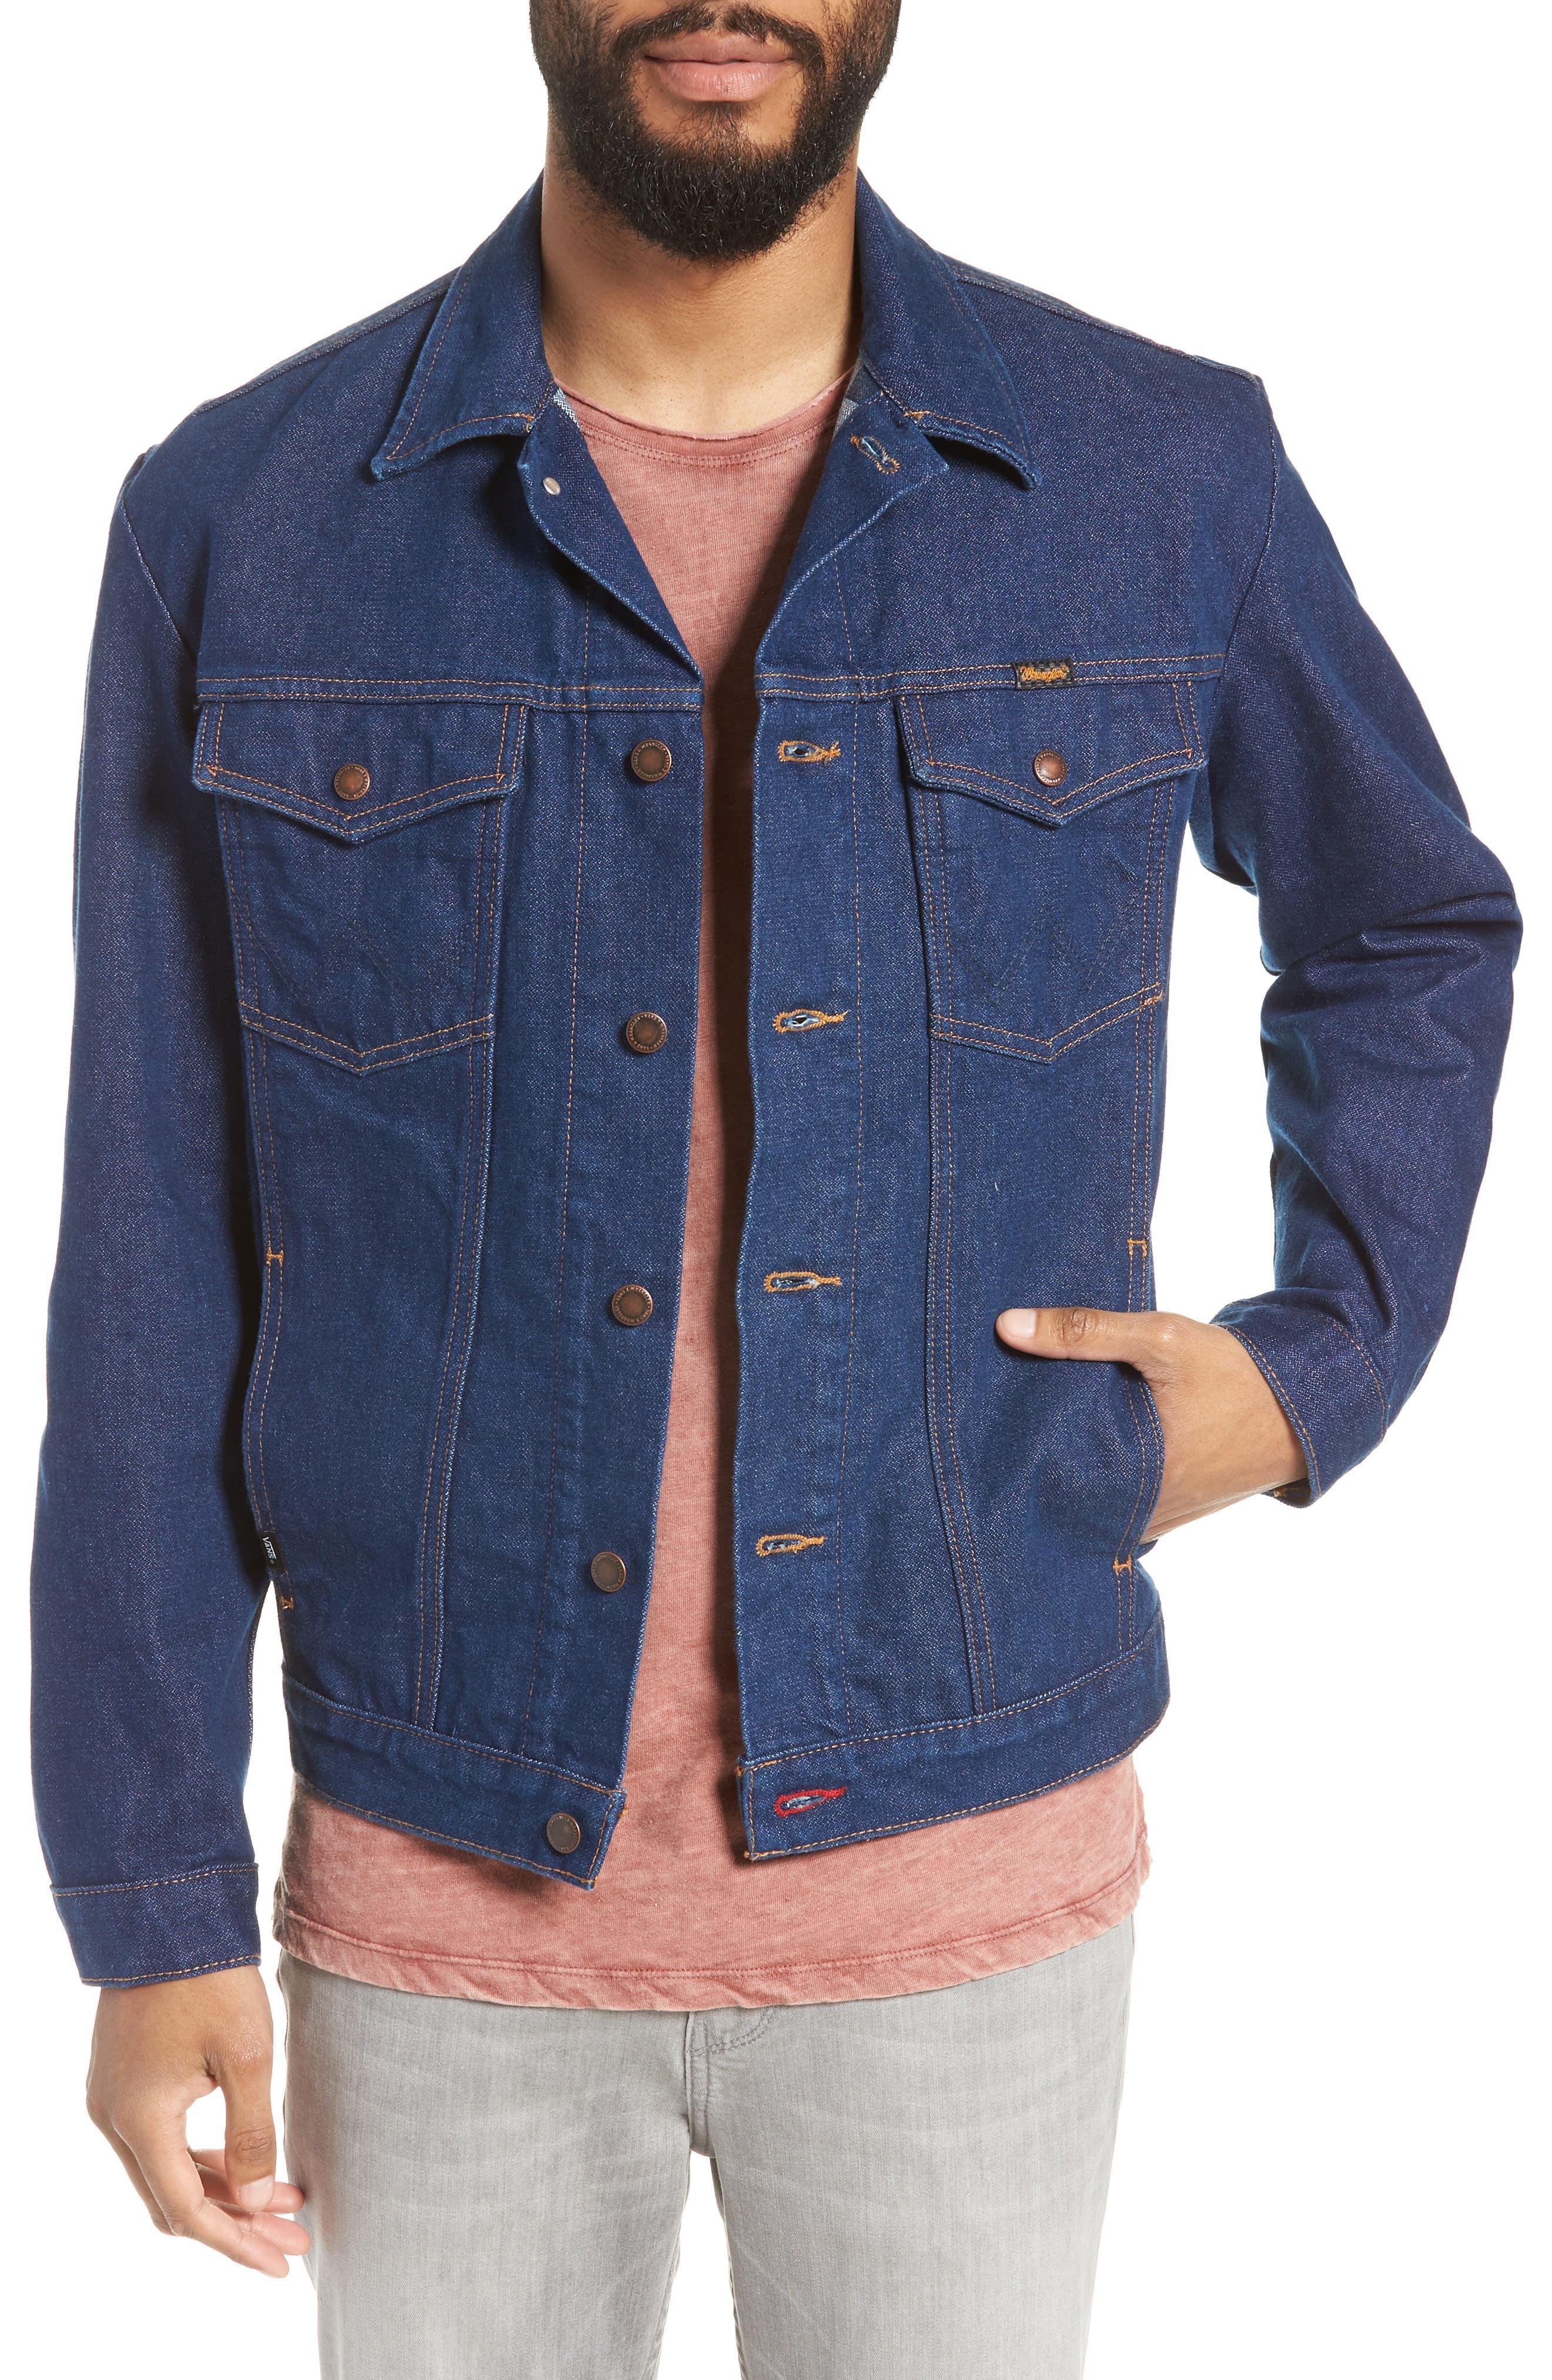 x Wrangler Denim Jacket,                             Main thumbnail 1, color,                             401